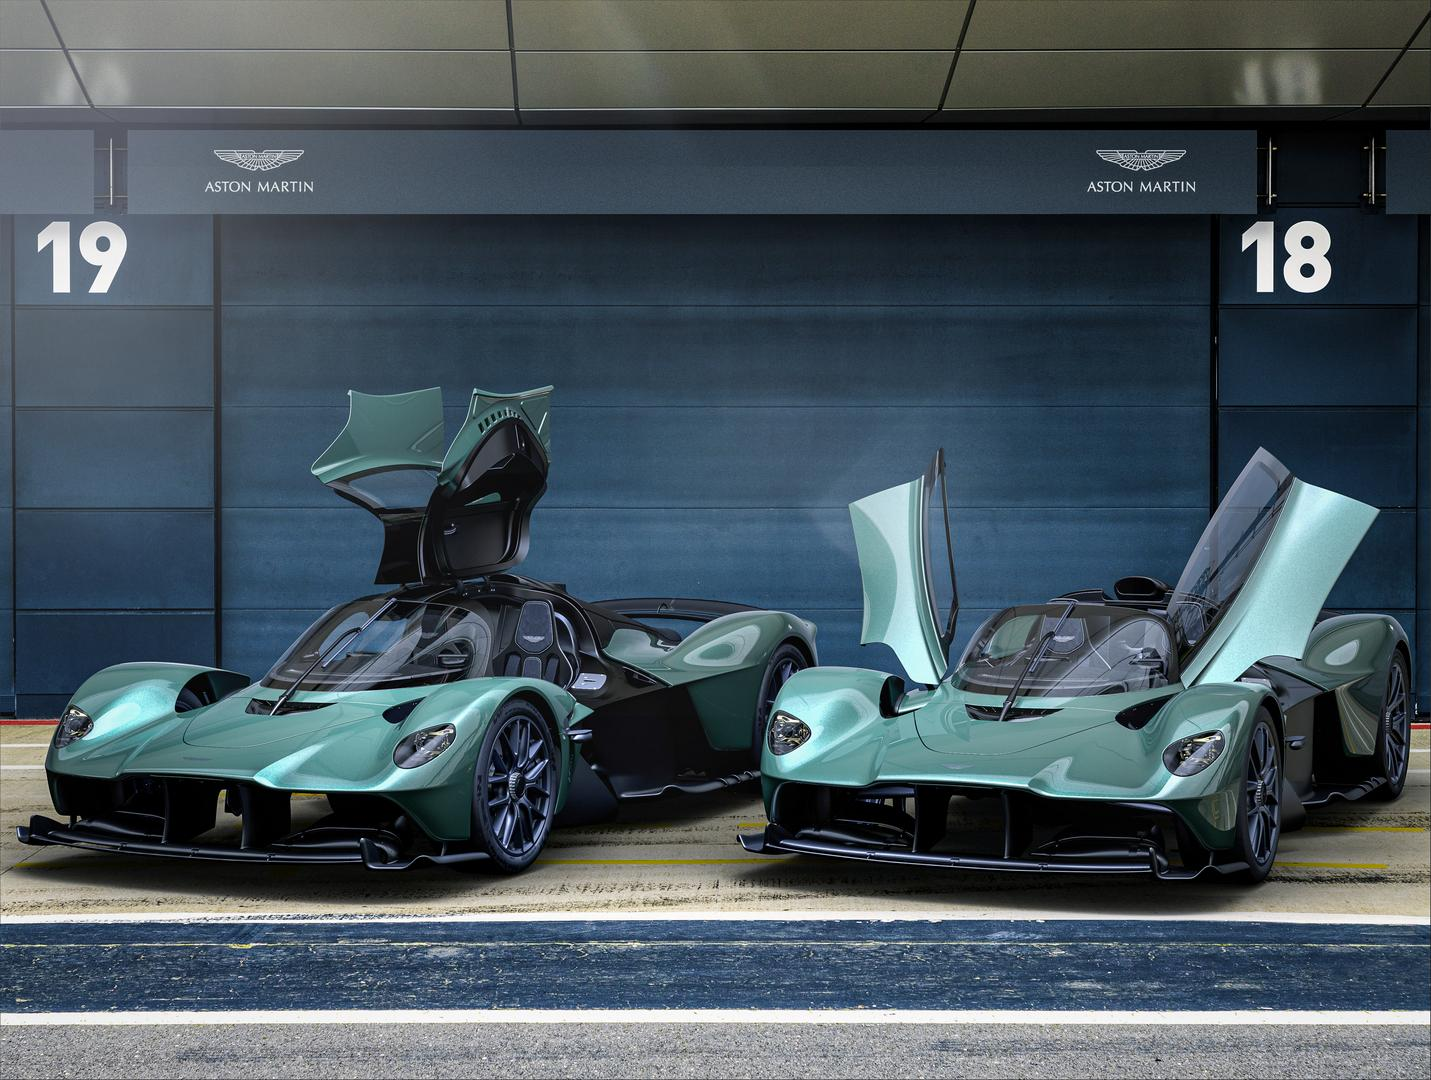 Aston Martin Valkyrie Spider to Cost $3.8 Million – 85 Cars Worldwide